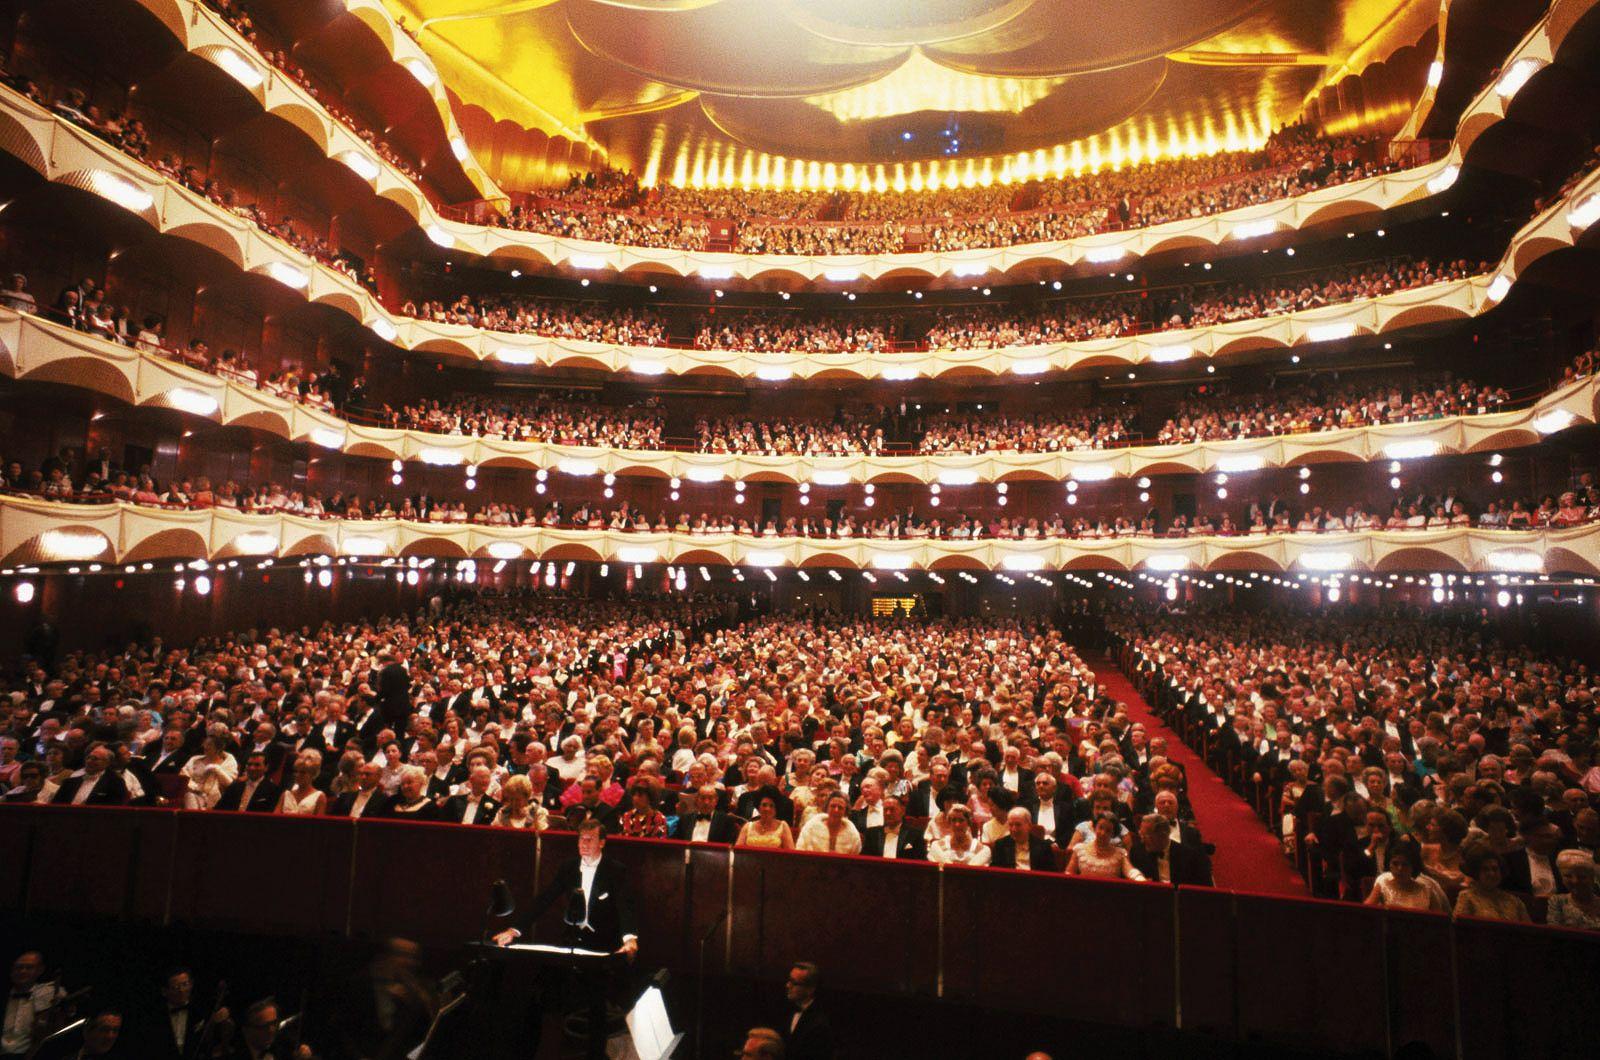 Pin By Lotrplus On Already Created Stories Metropolitan Opera Opera Music Opera